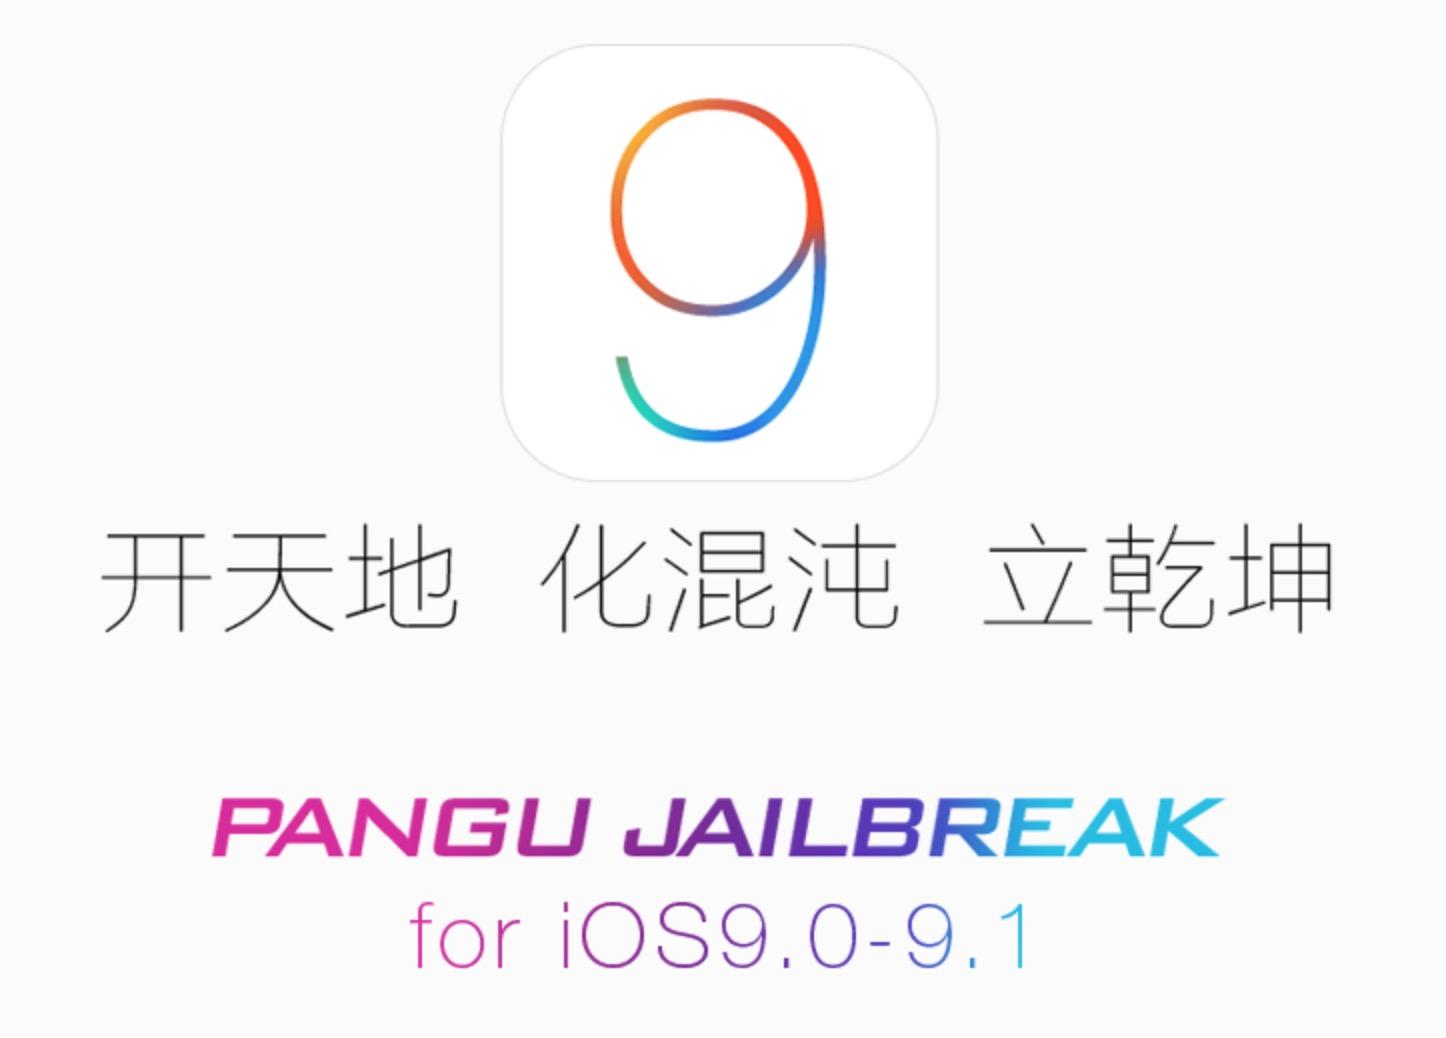 Download pangu ios 9. 1 jailbreak for mac and windows.